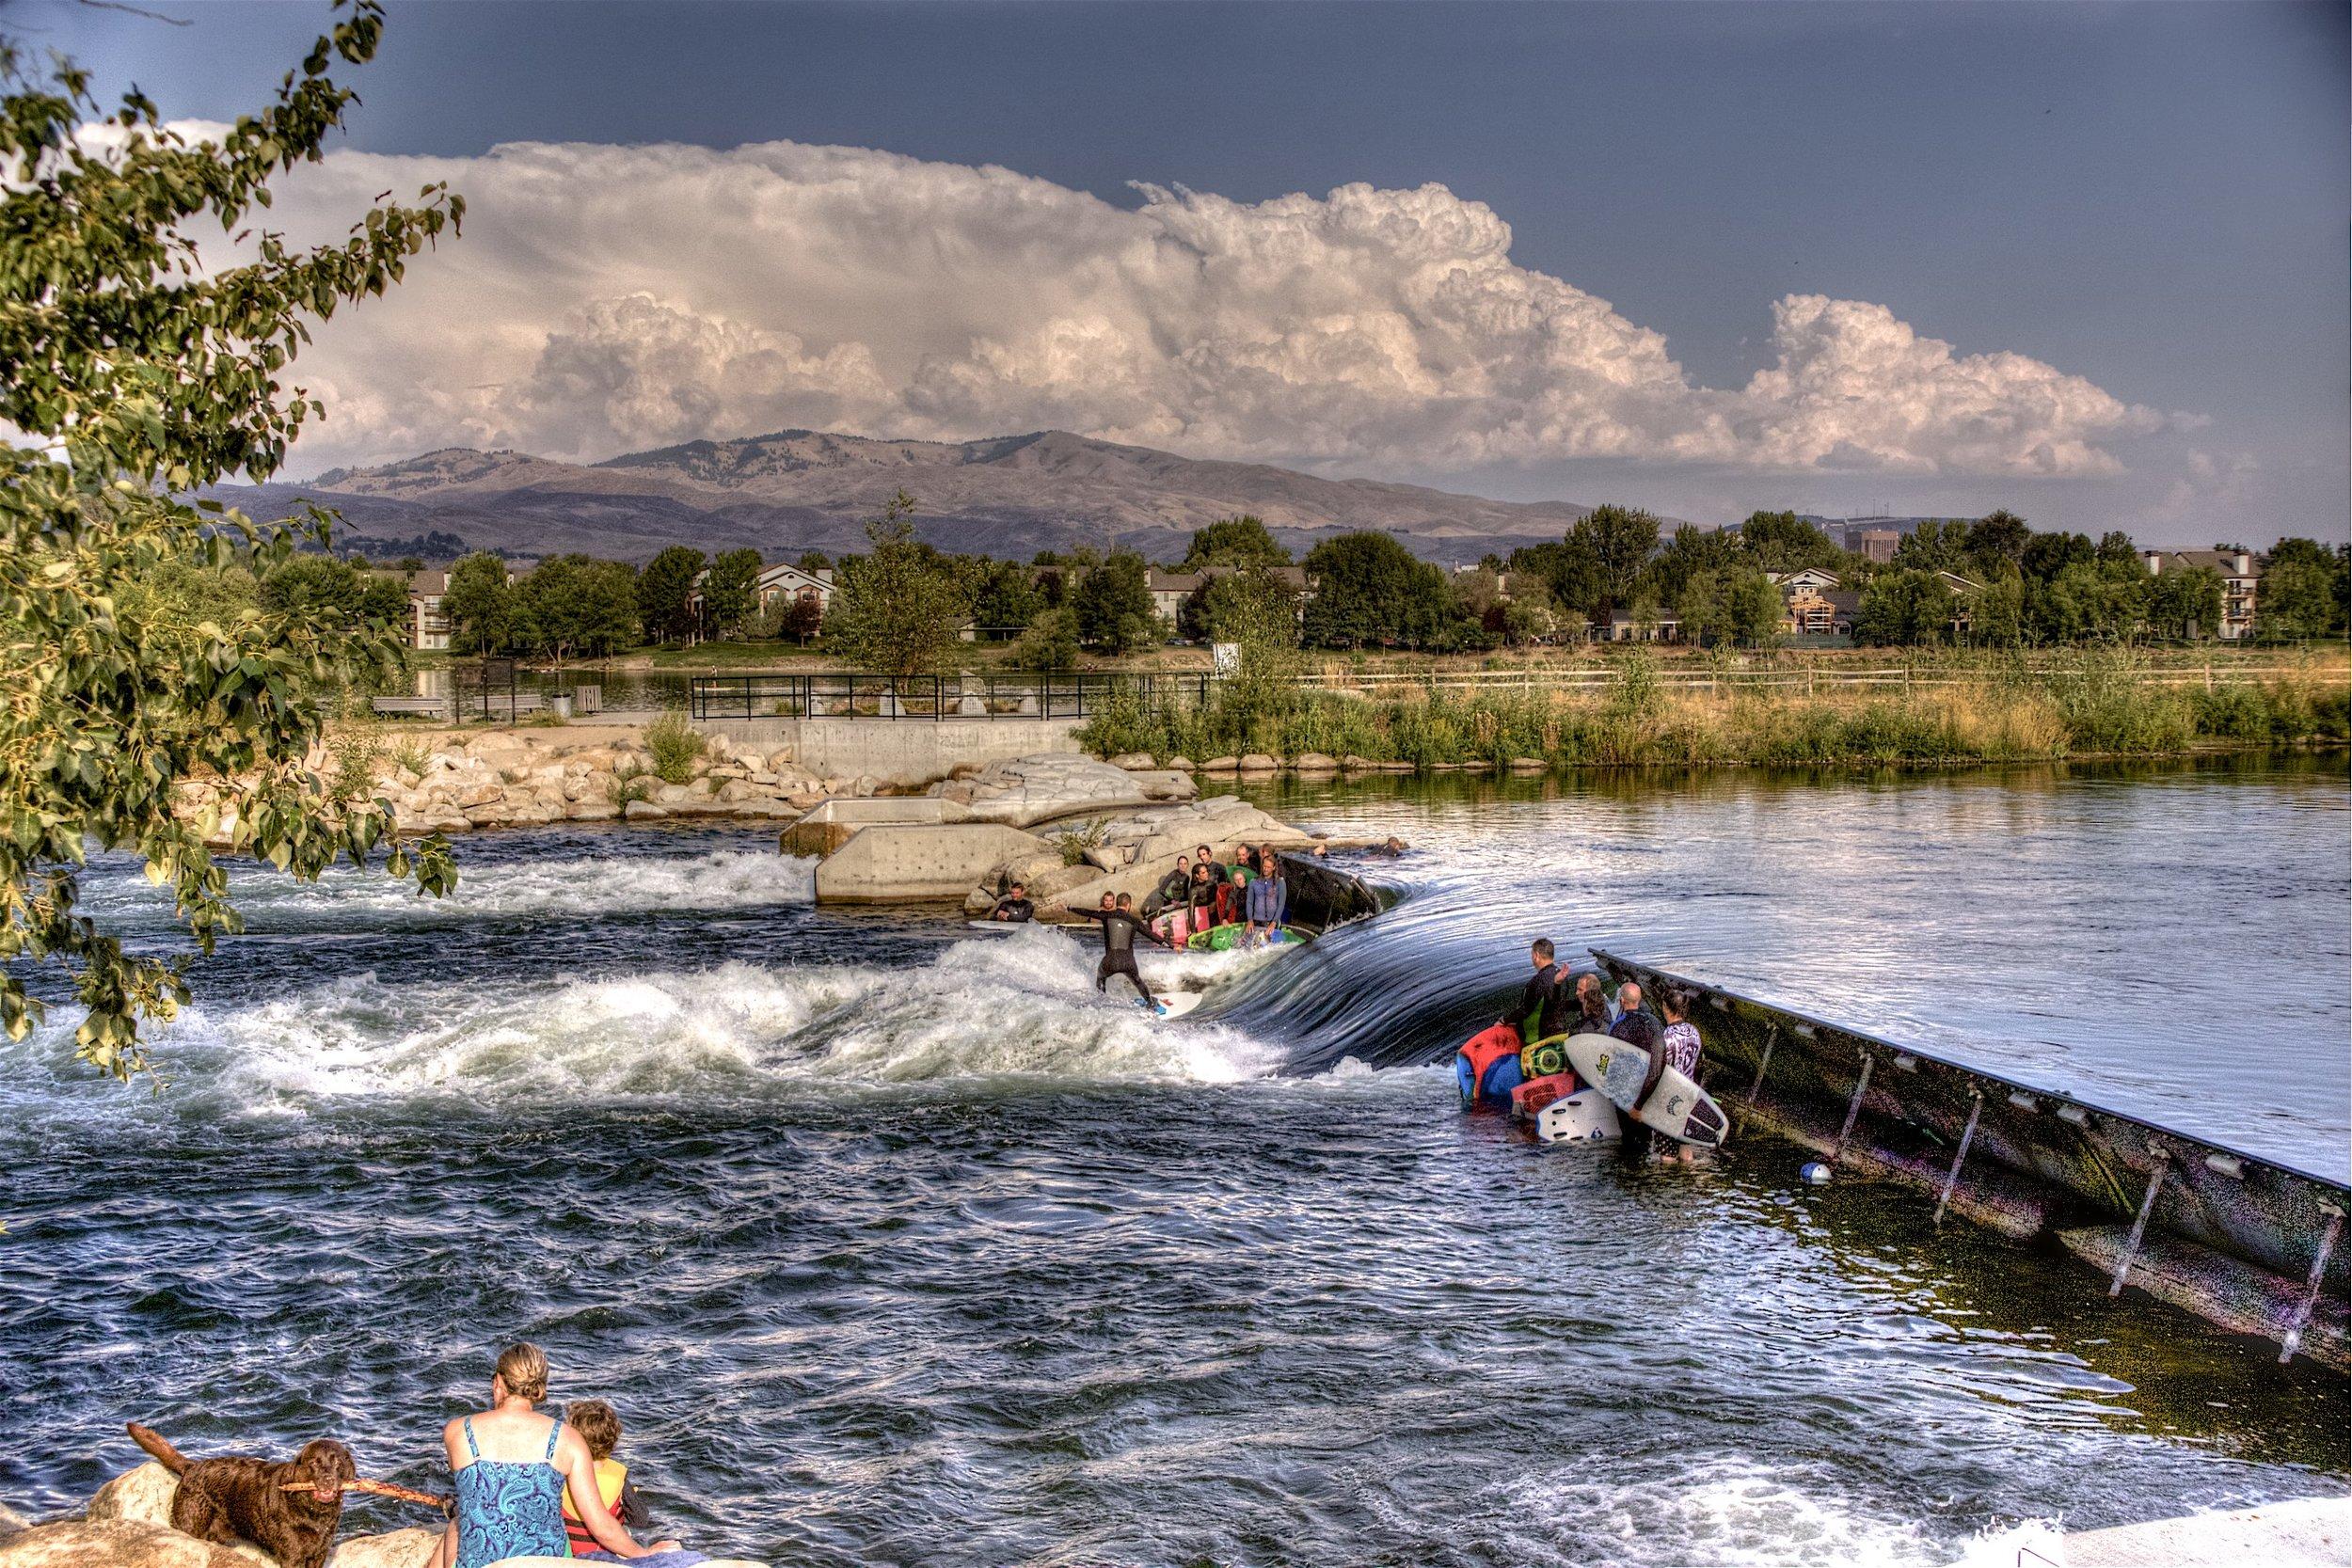 Image courtesy of Boise Convention & Visitors Bureau